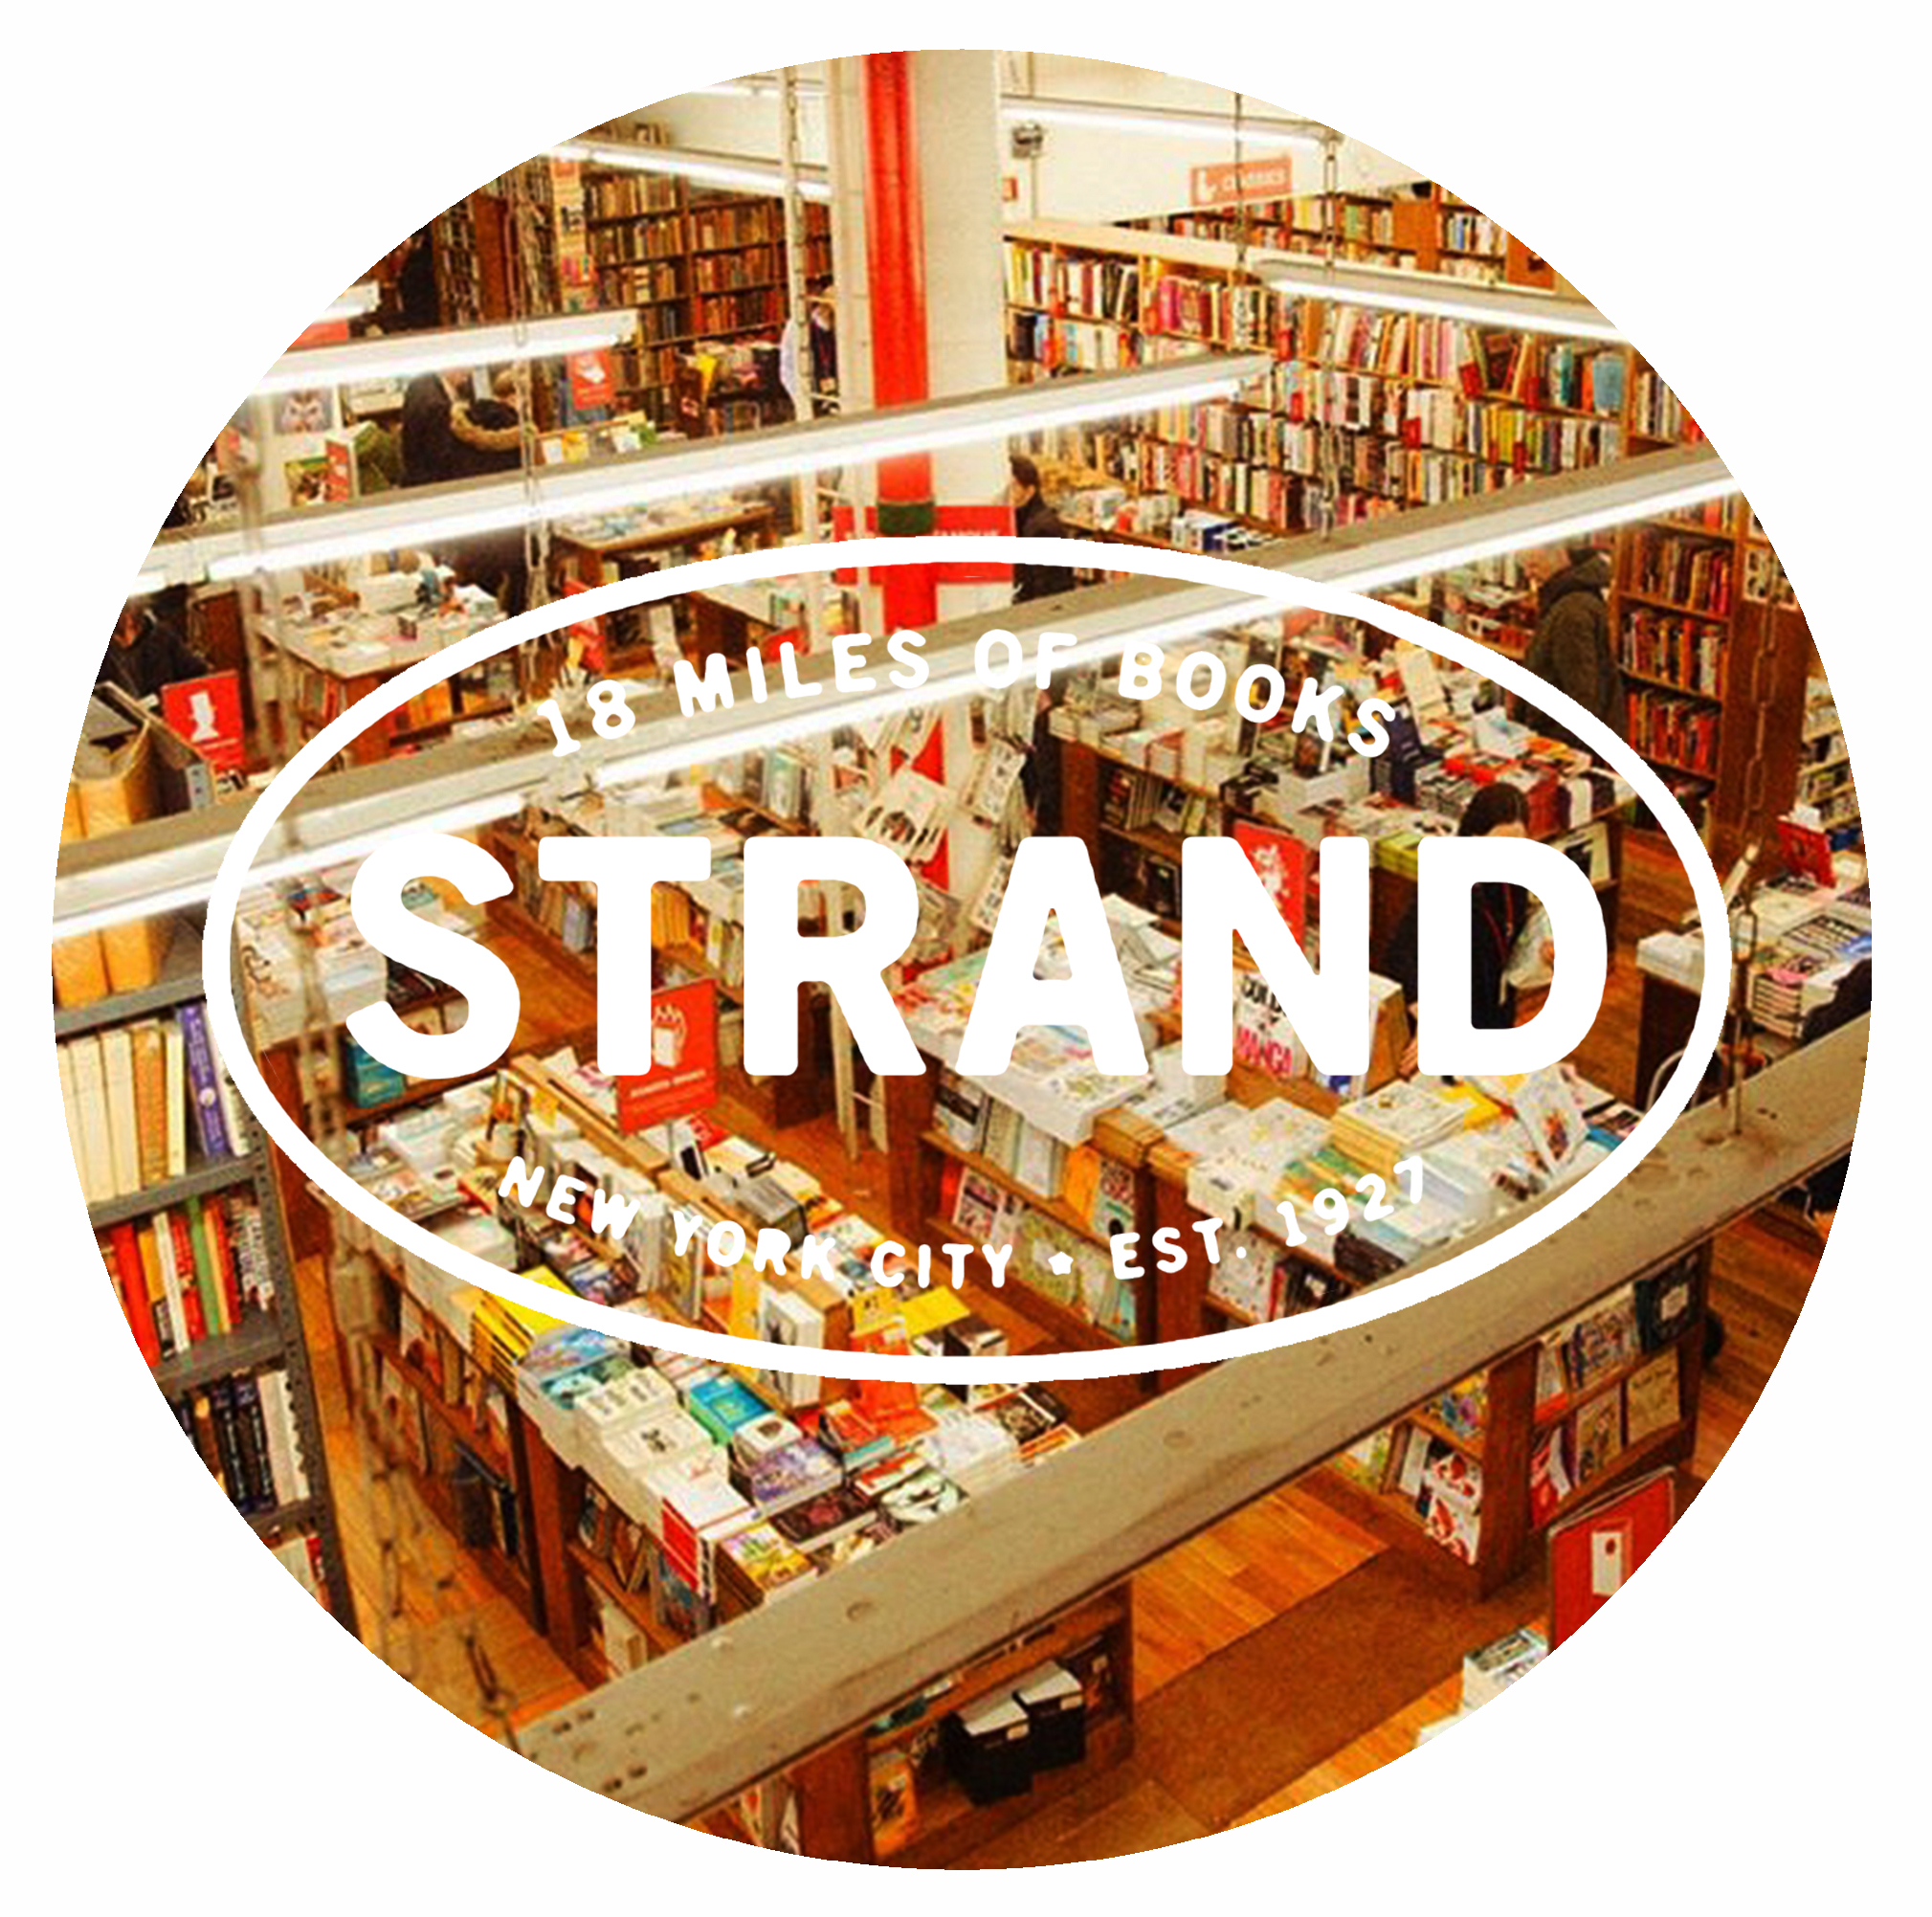 STRAND BOOKSTORE 28 Broadway, New York, NY 10003